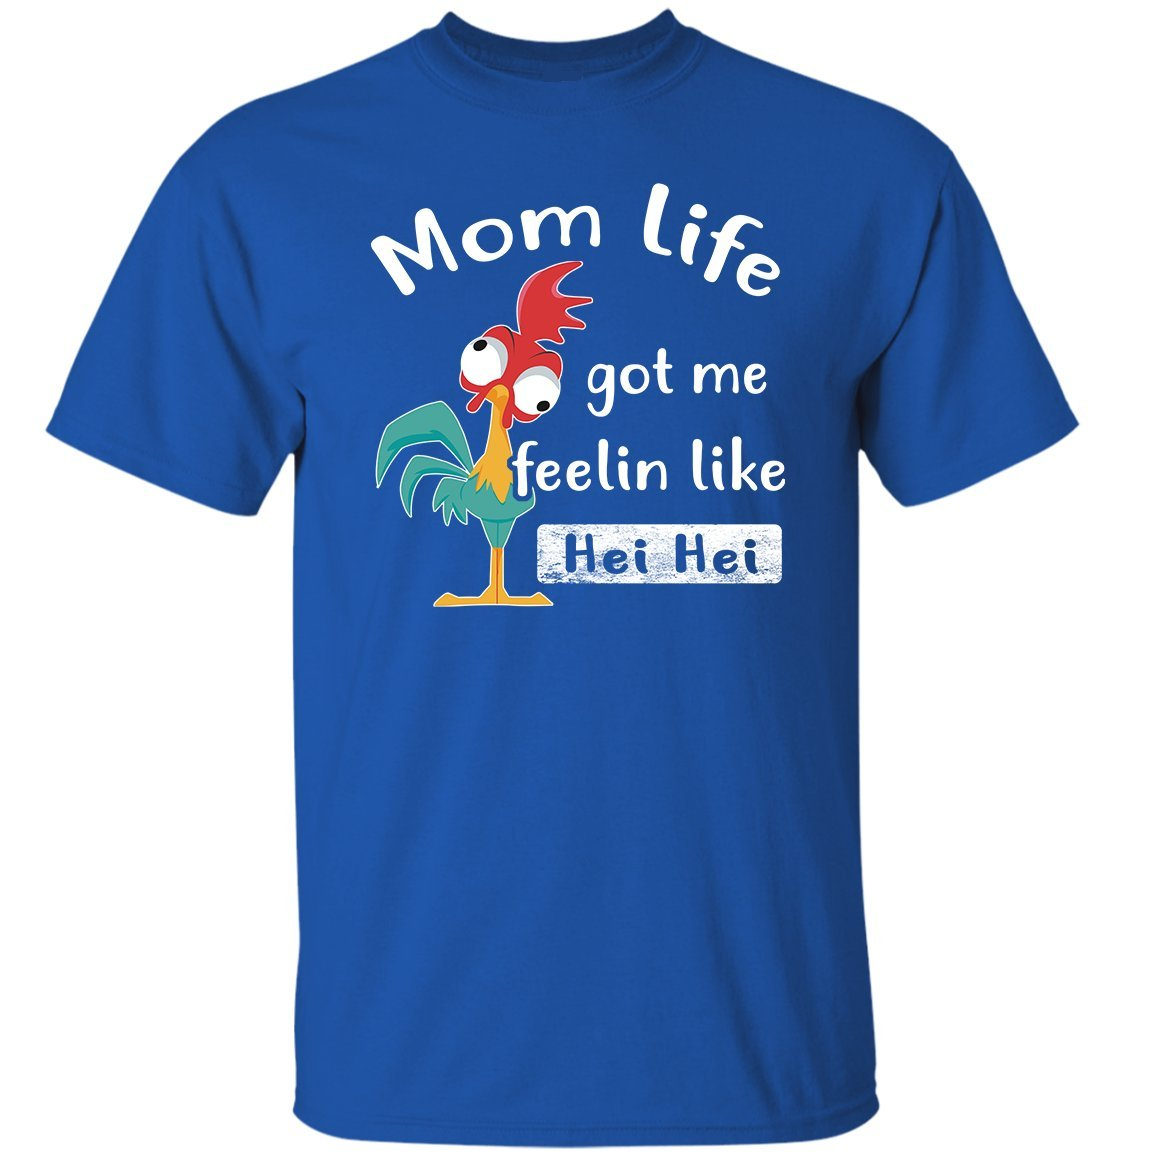 Mom Life Got Me Feelin Like Hei Shirt Funny Mother's Day Gift T-shirt